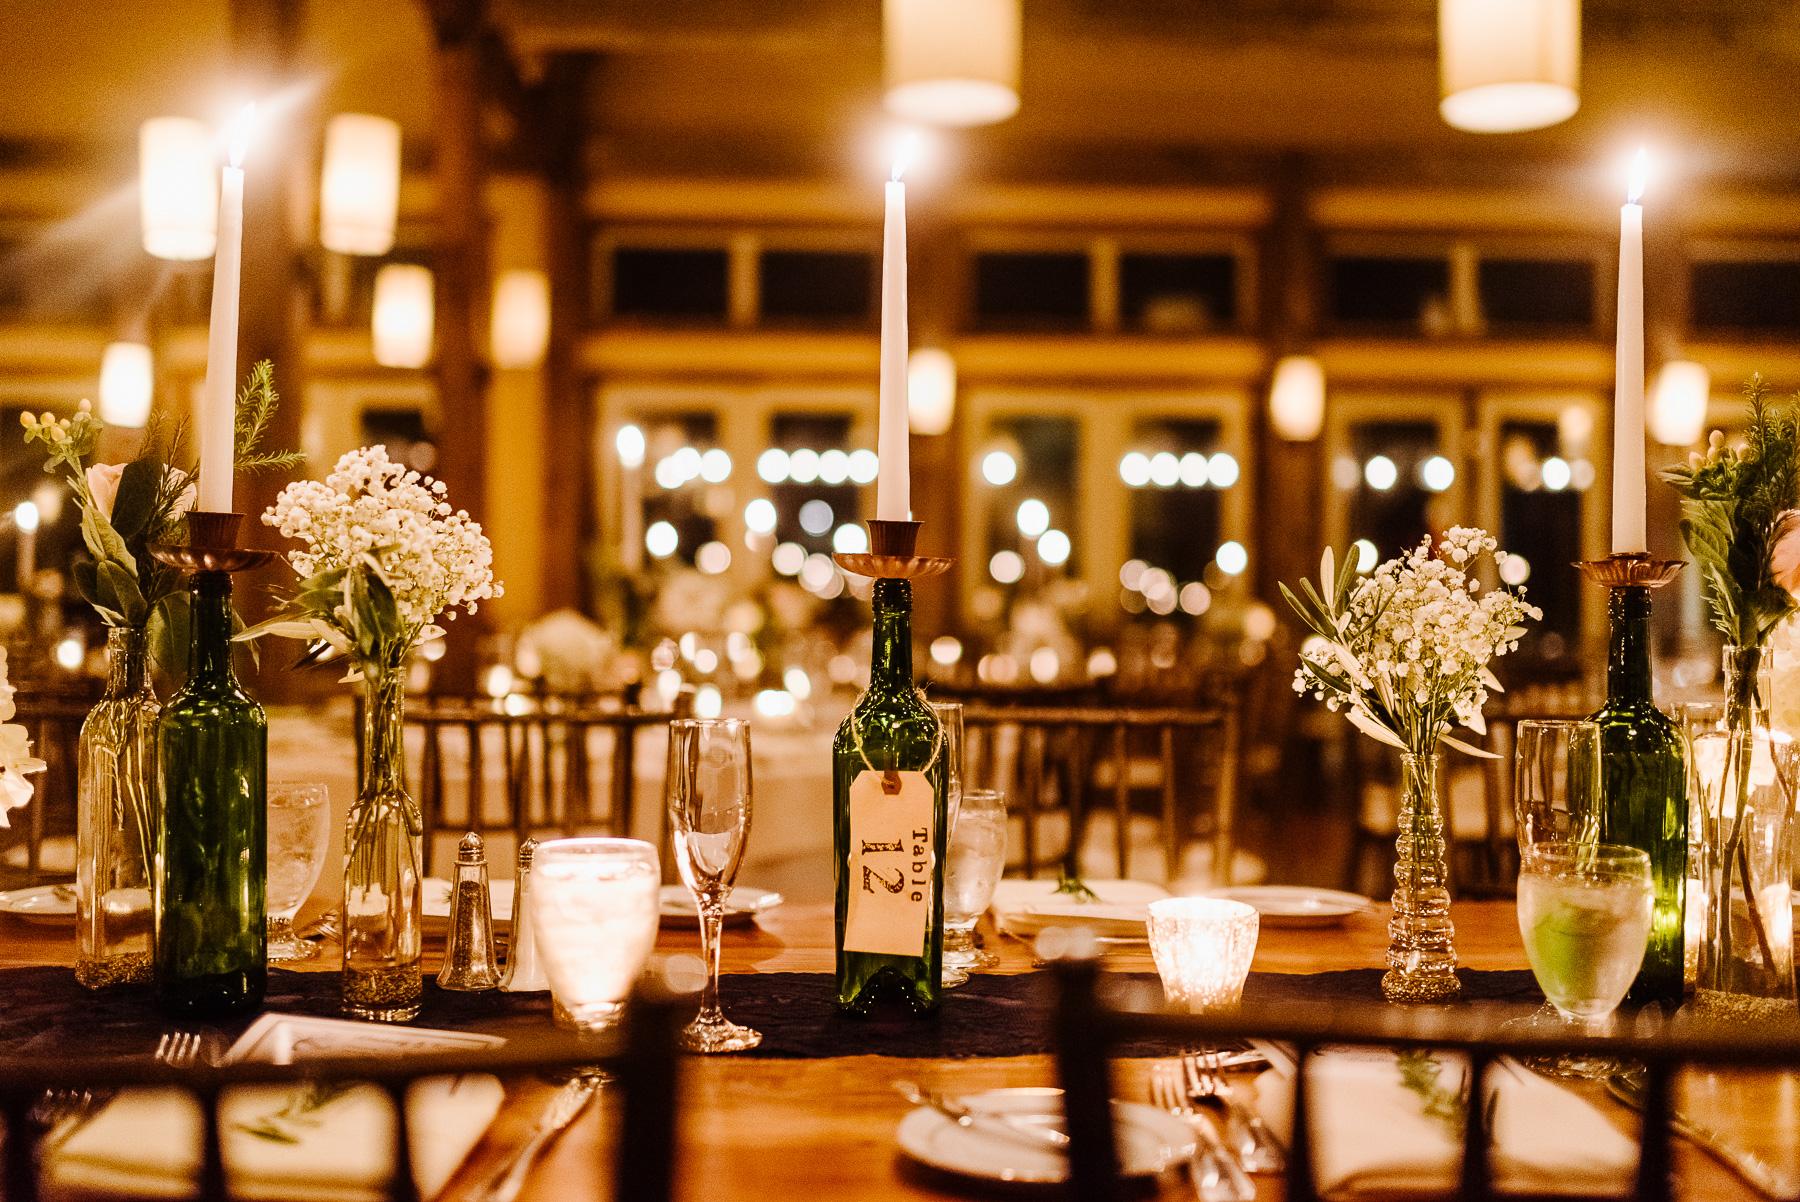 101-Laurita Winery Wedding New Jersey Wedding Photographer Laurita Winery Weddings Longbrook Photography.jpg